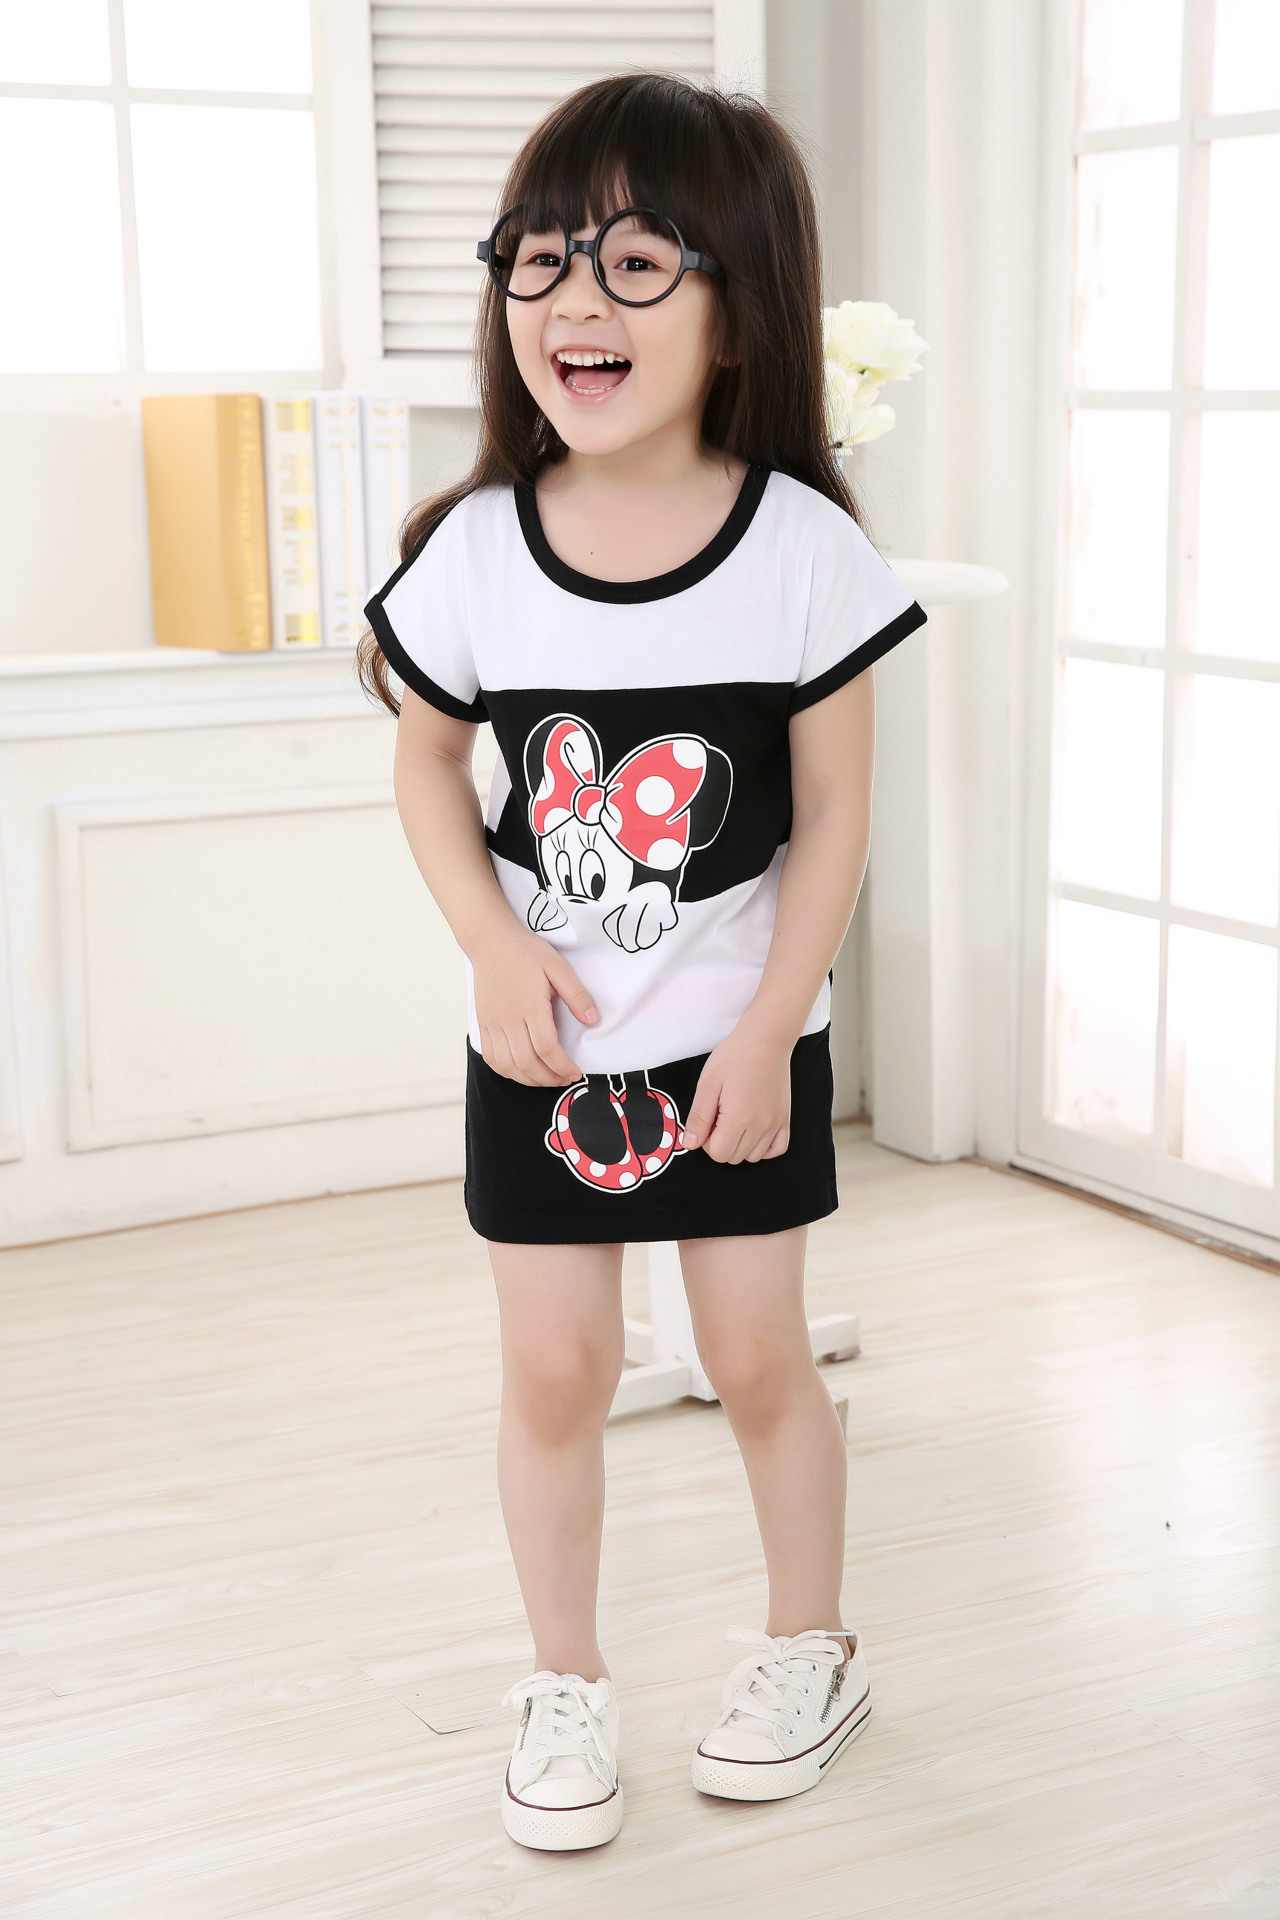 2016 New Spring And Summer Girls Dress Up Minnie Cartoon Printed Children Girl Princess Dress Cute Girl Dress Fashion(China (Mainland))